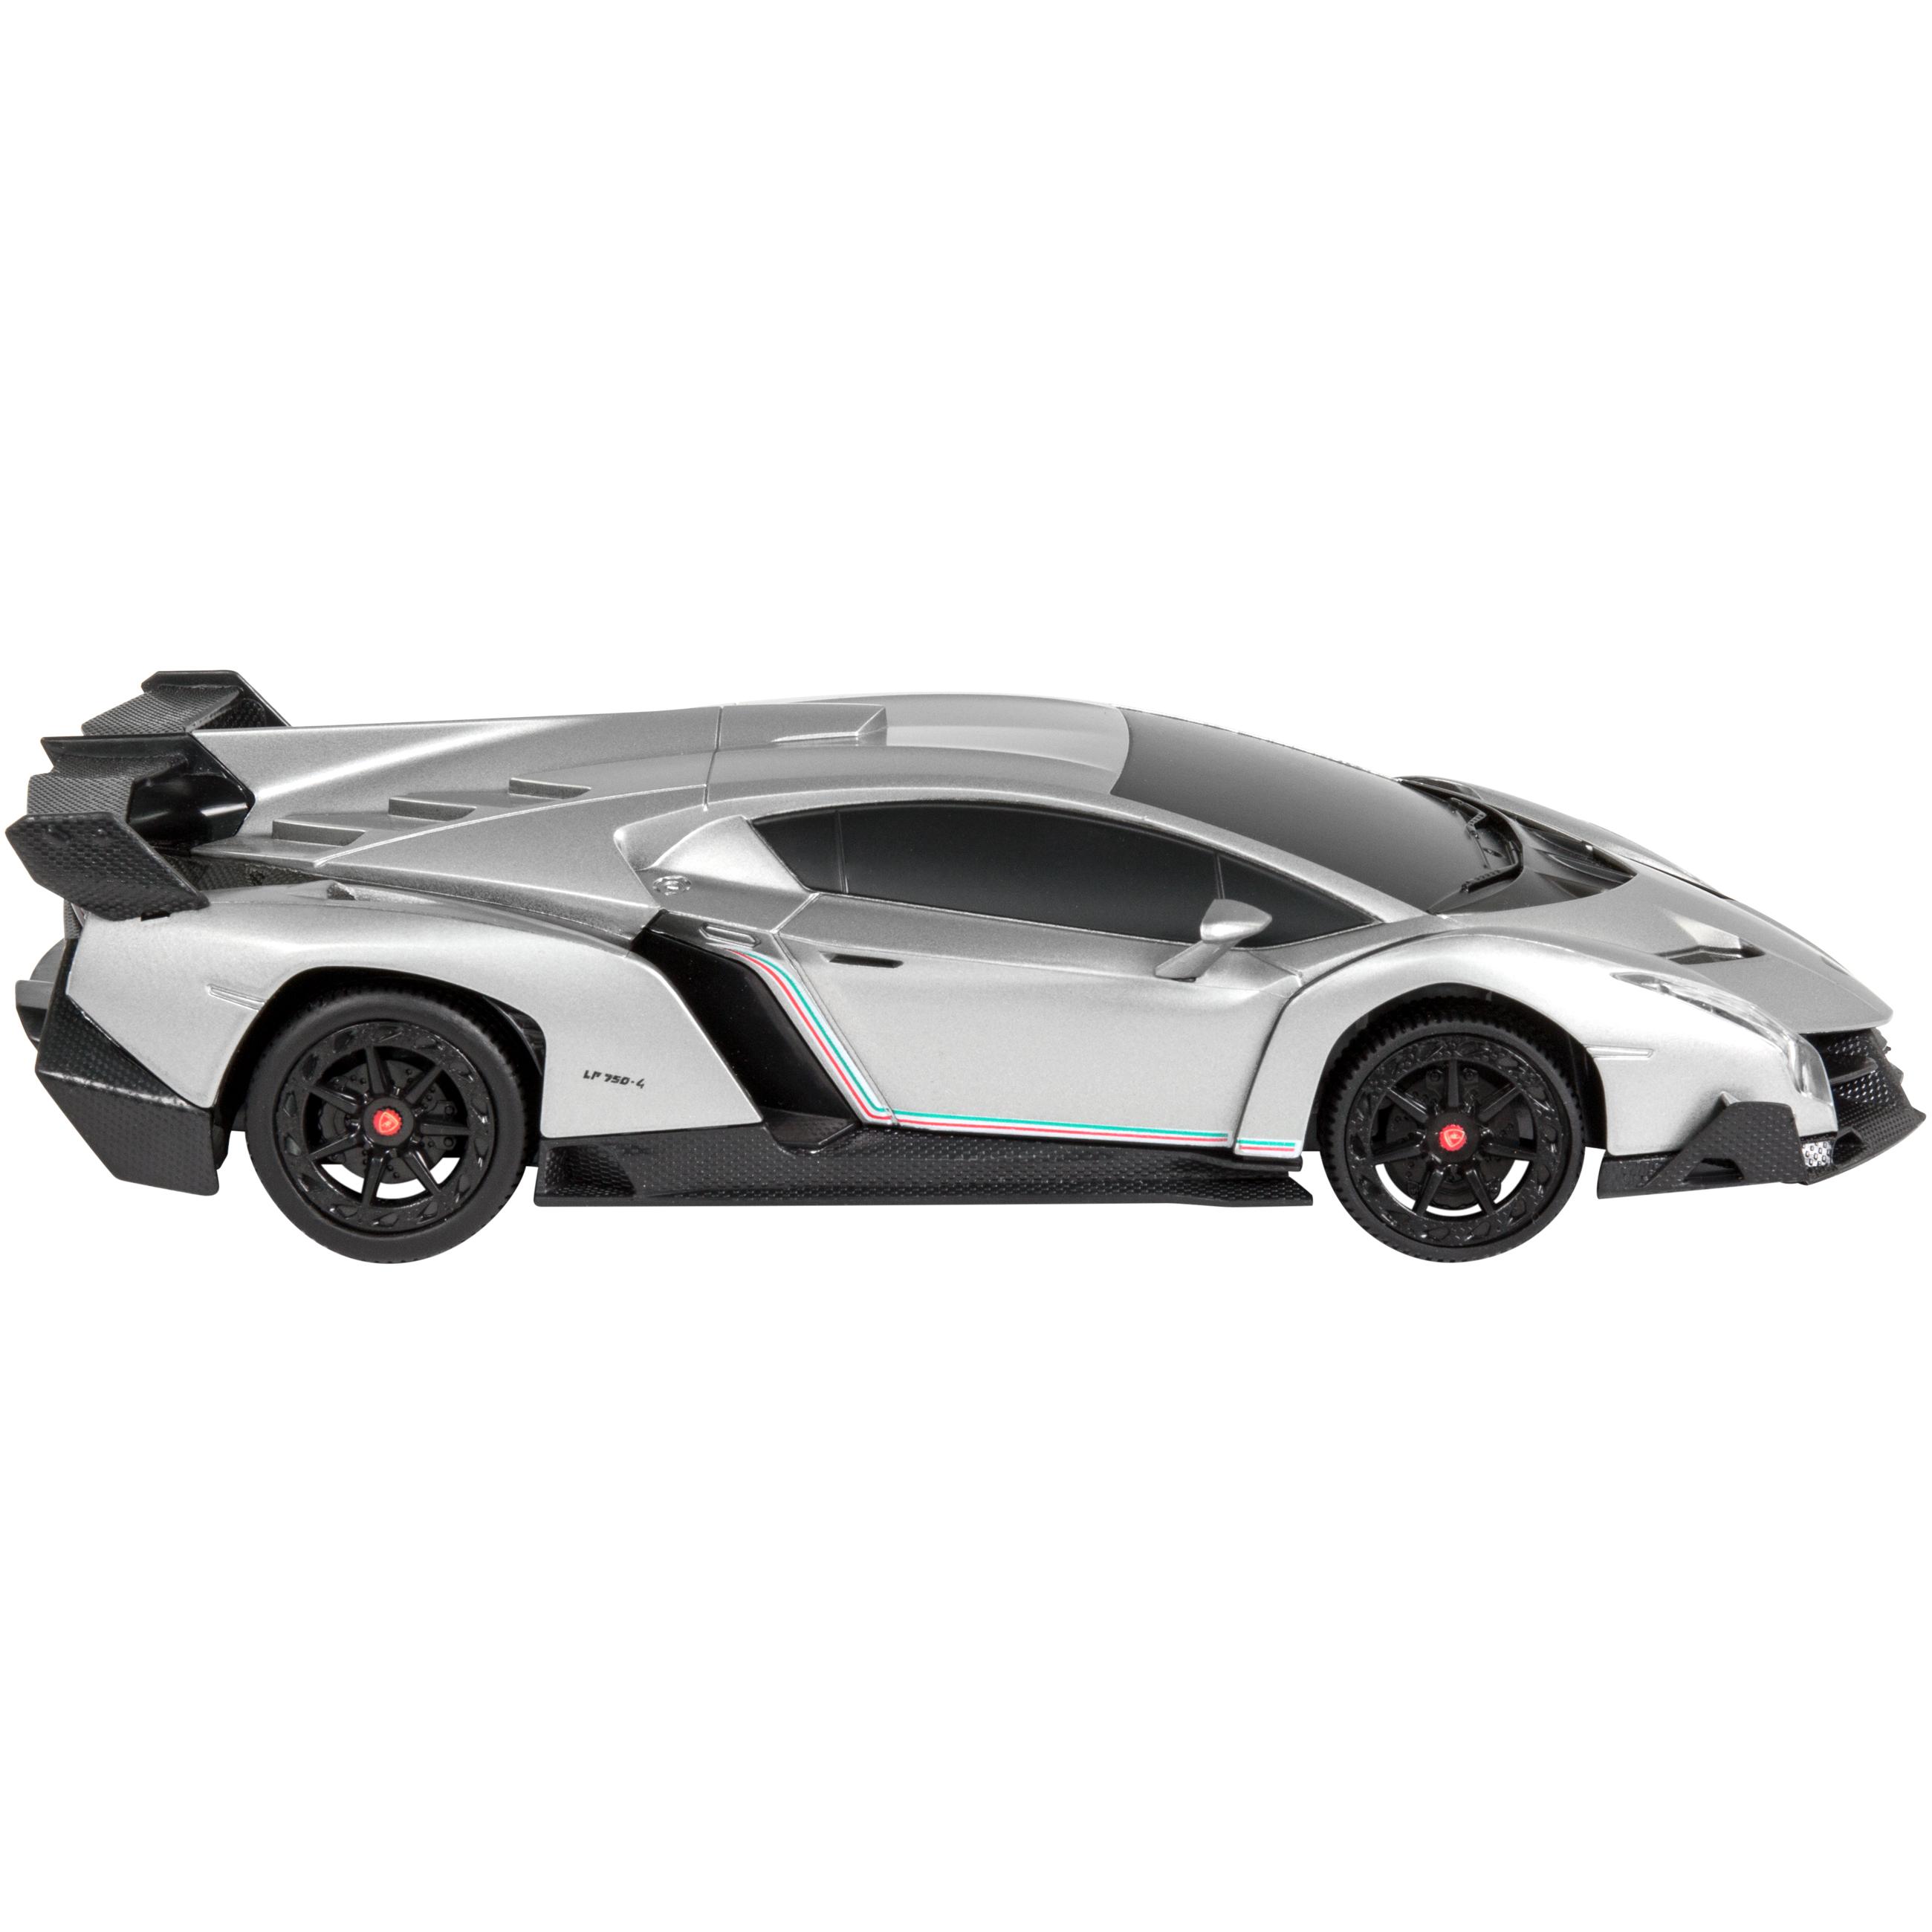 BCP-1-24-Kids-RC-Lamborghini-Veneno-Racing-Car-Toy-w-Lights-Shock-Suspension thumbnail 24